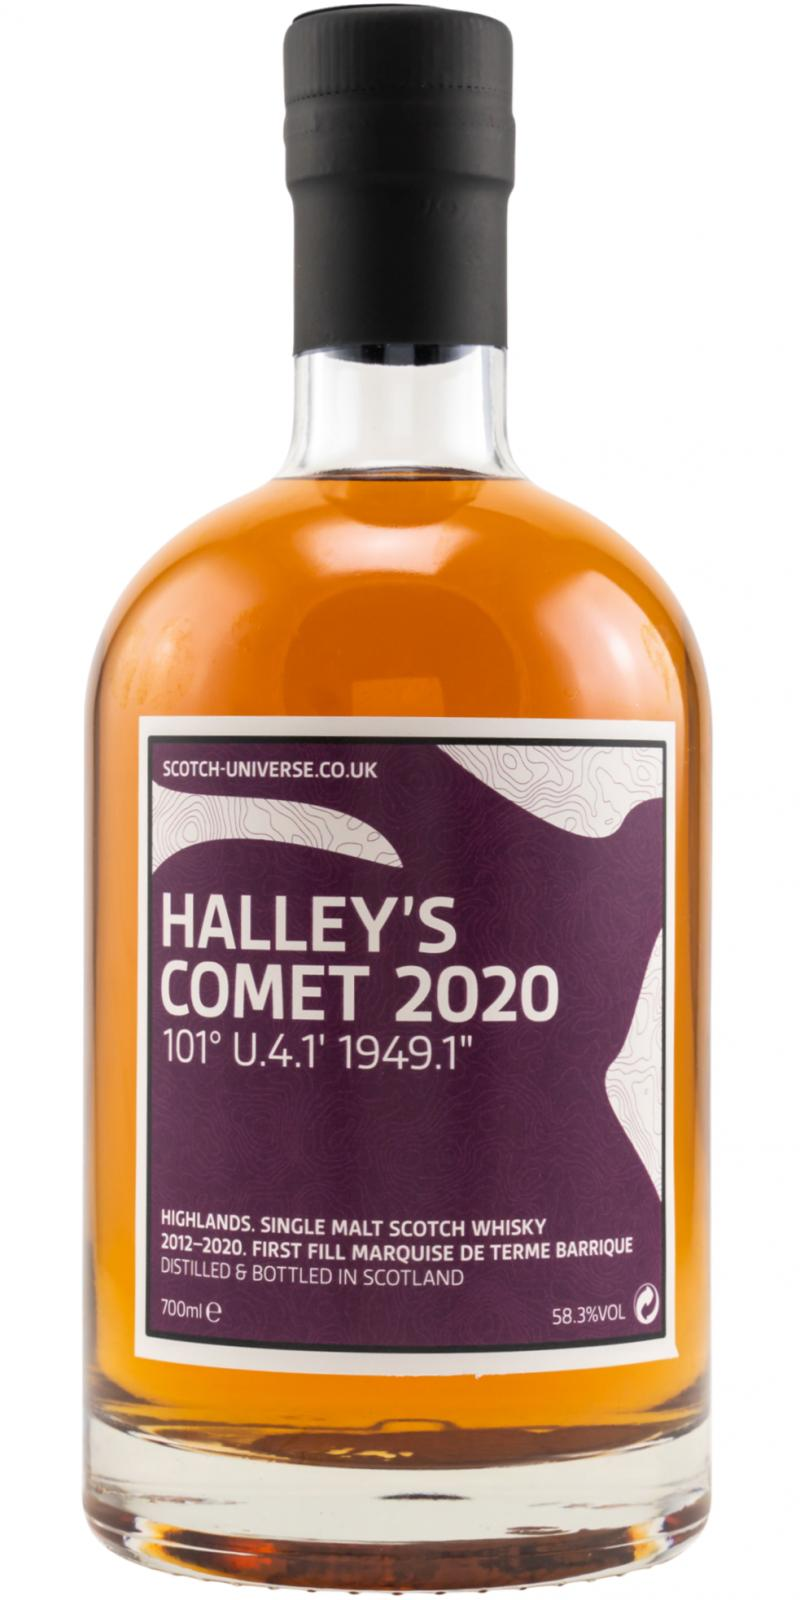 "Scotch Universe Halley's Comet 2020 - 101° U.4.1' 1949.1"""